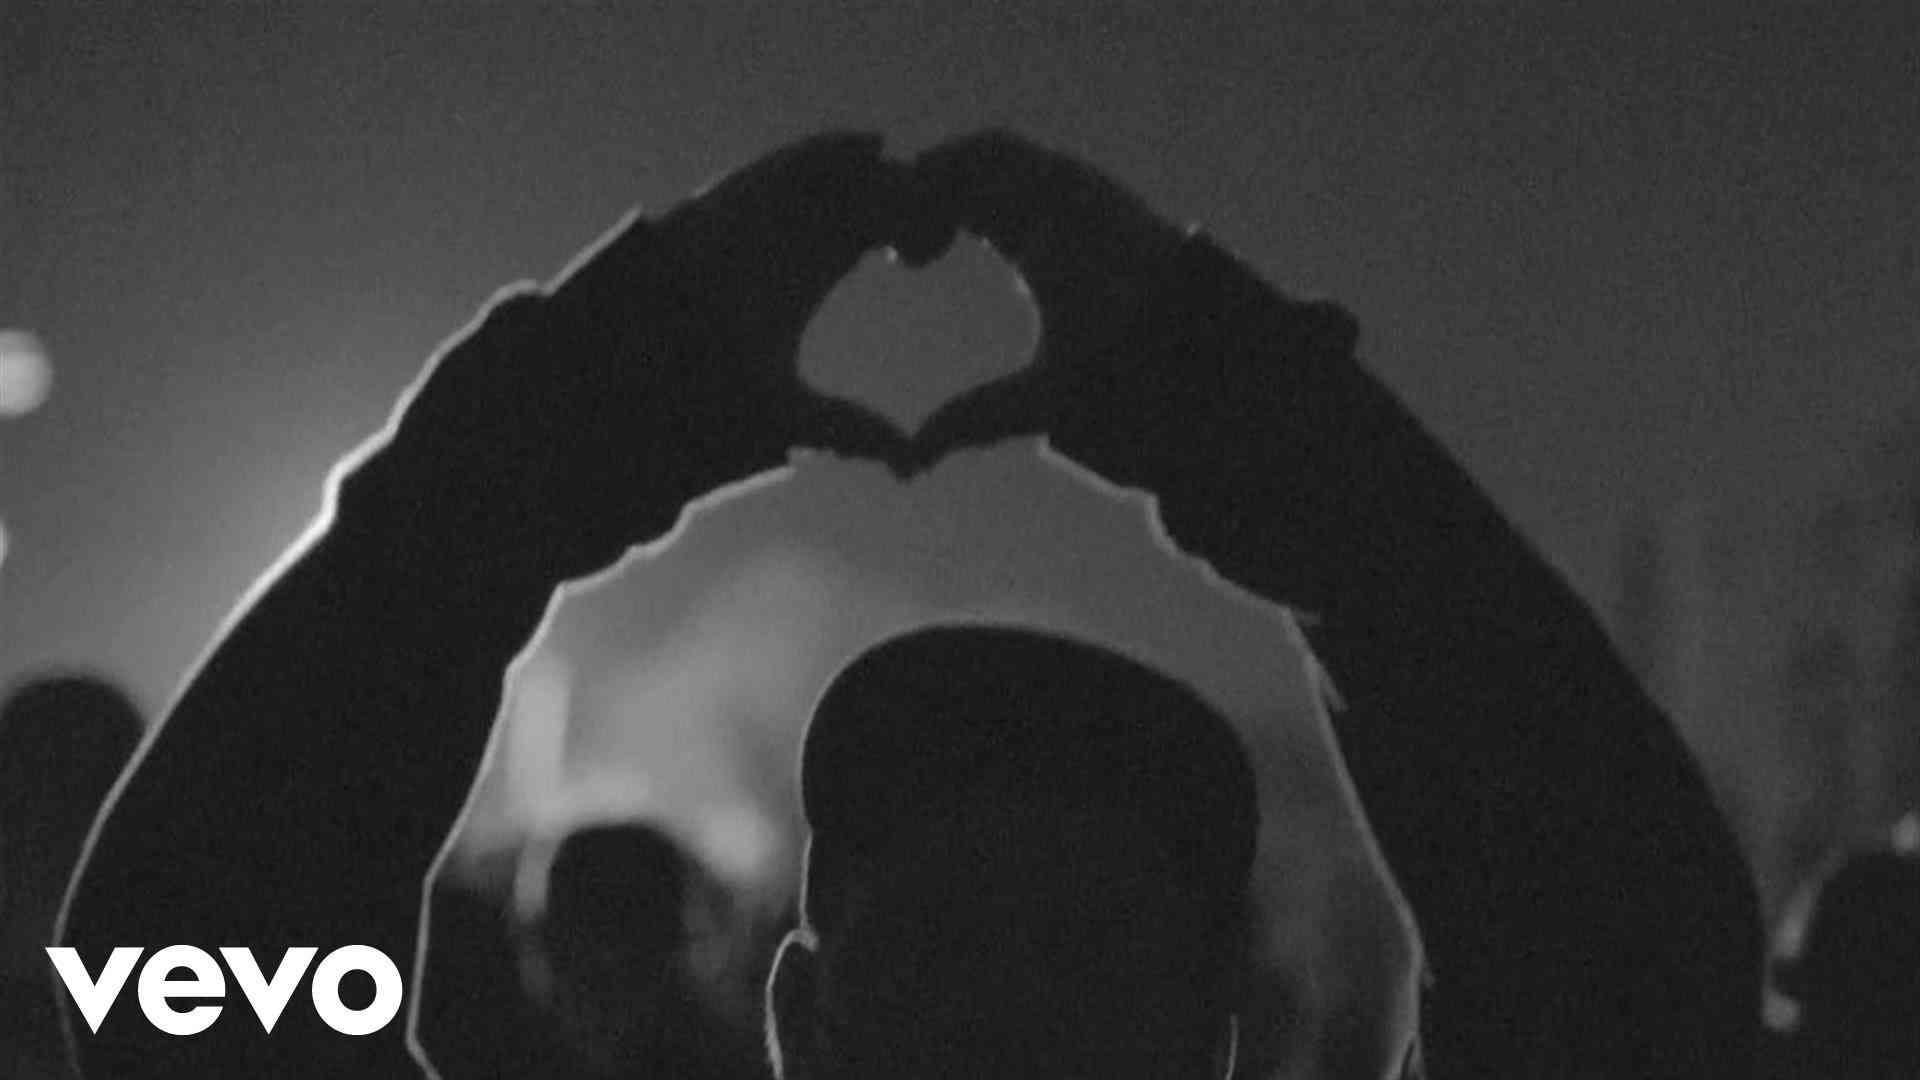 Swedish House Mafia - DontWorry Child ft. John Martin - YouTube